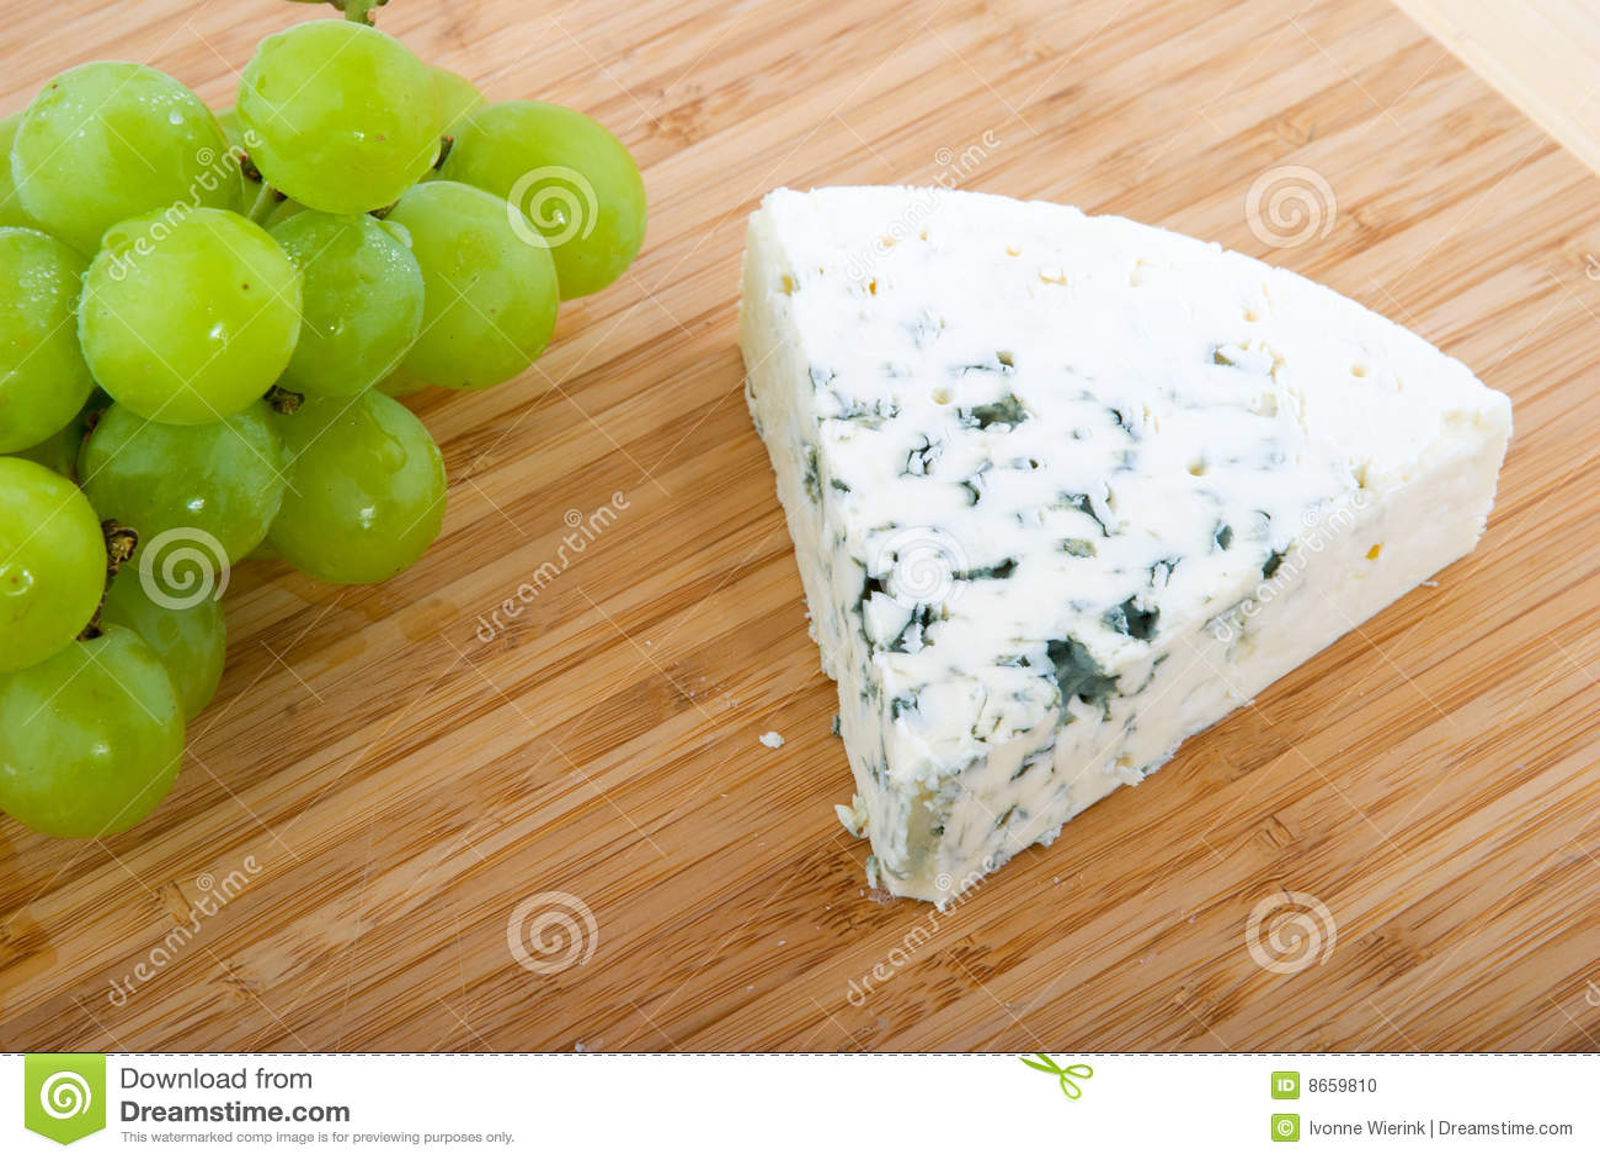 Bleu danois